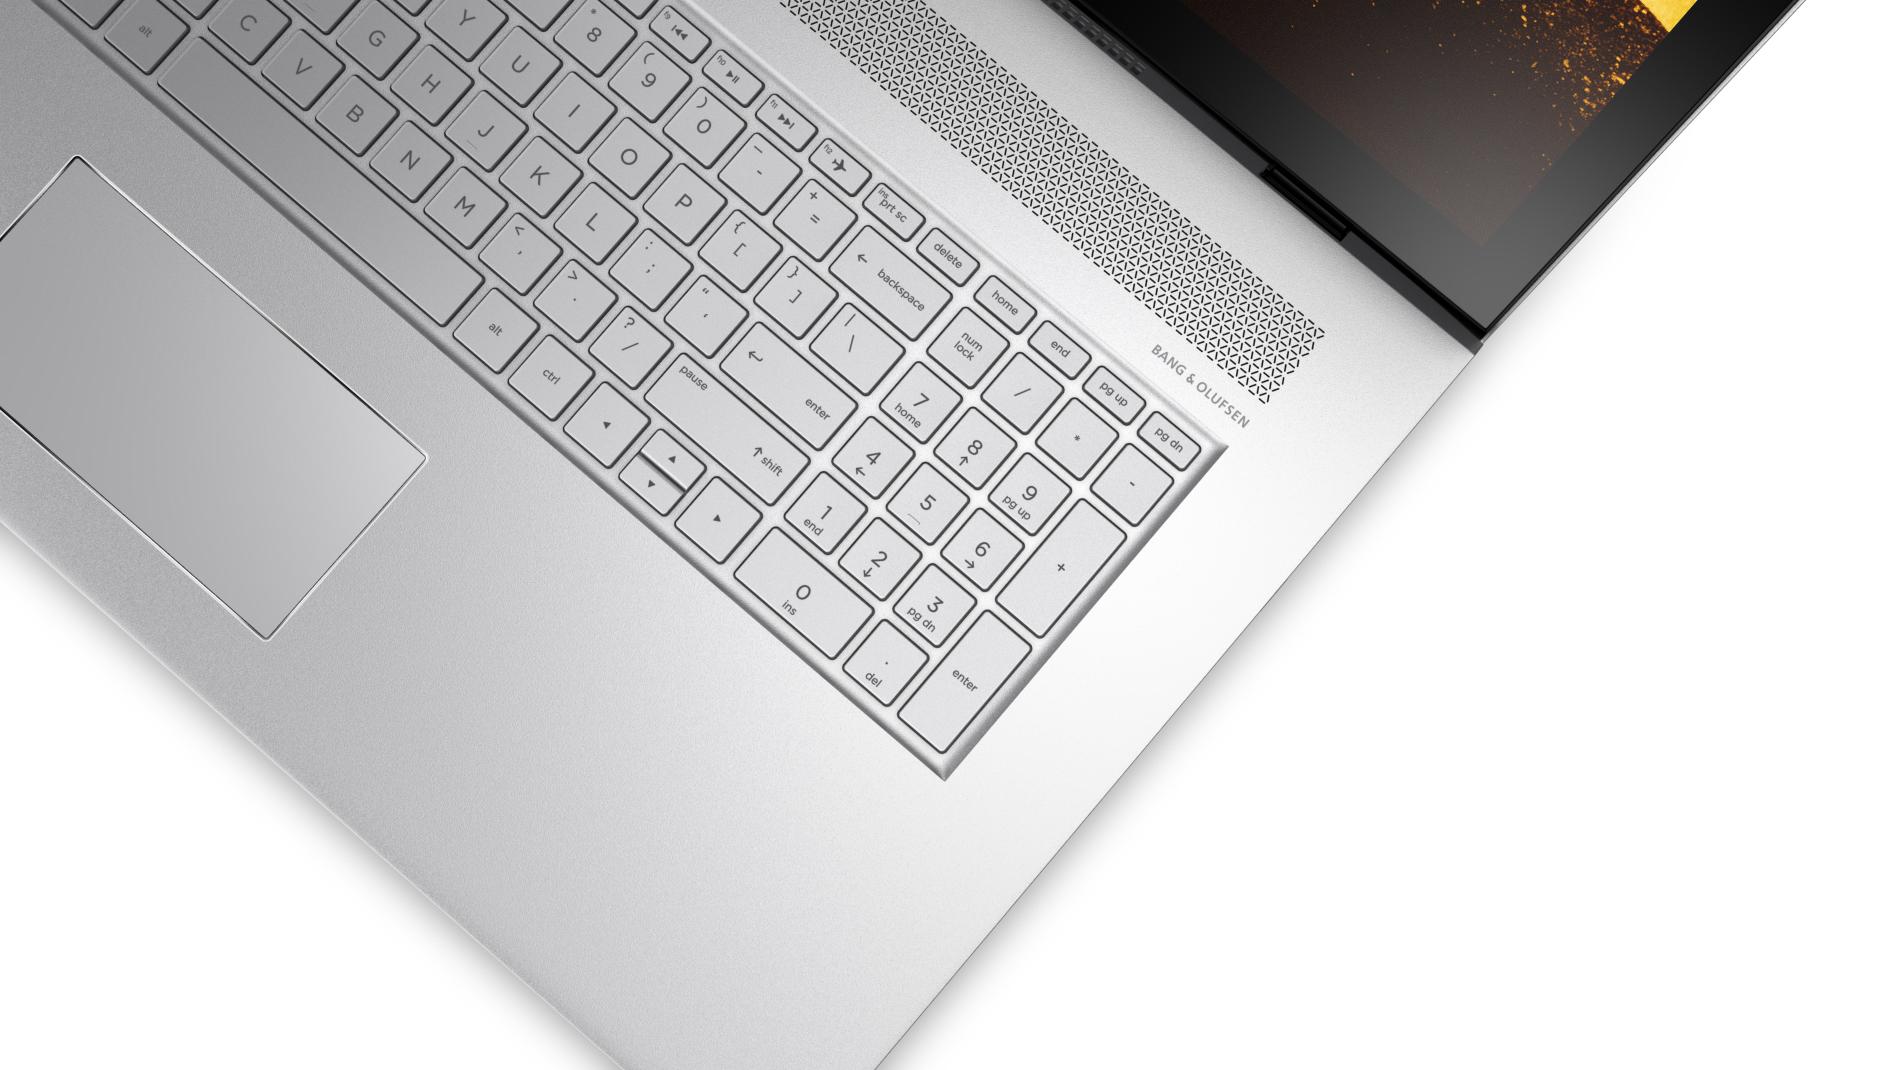 HP Envy 17 (i5-8250U, MX150, SSD, FHD) Laptop Review - NotebookCheck